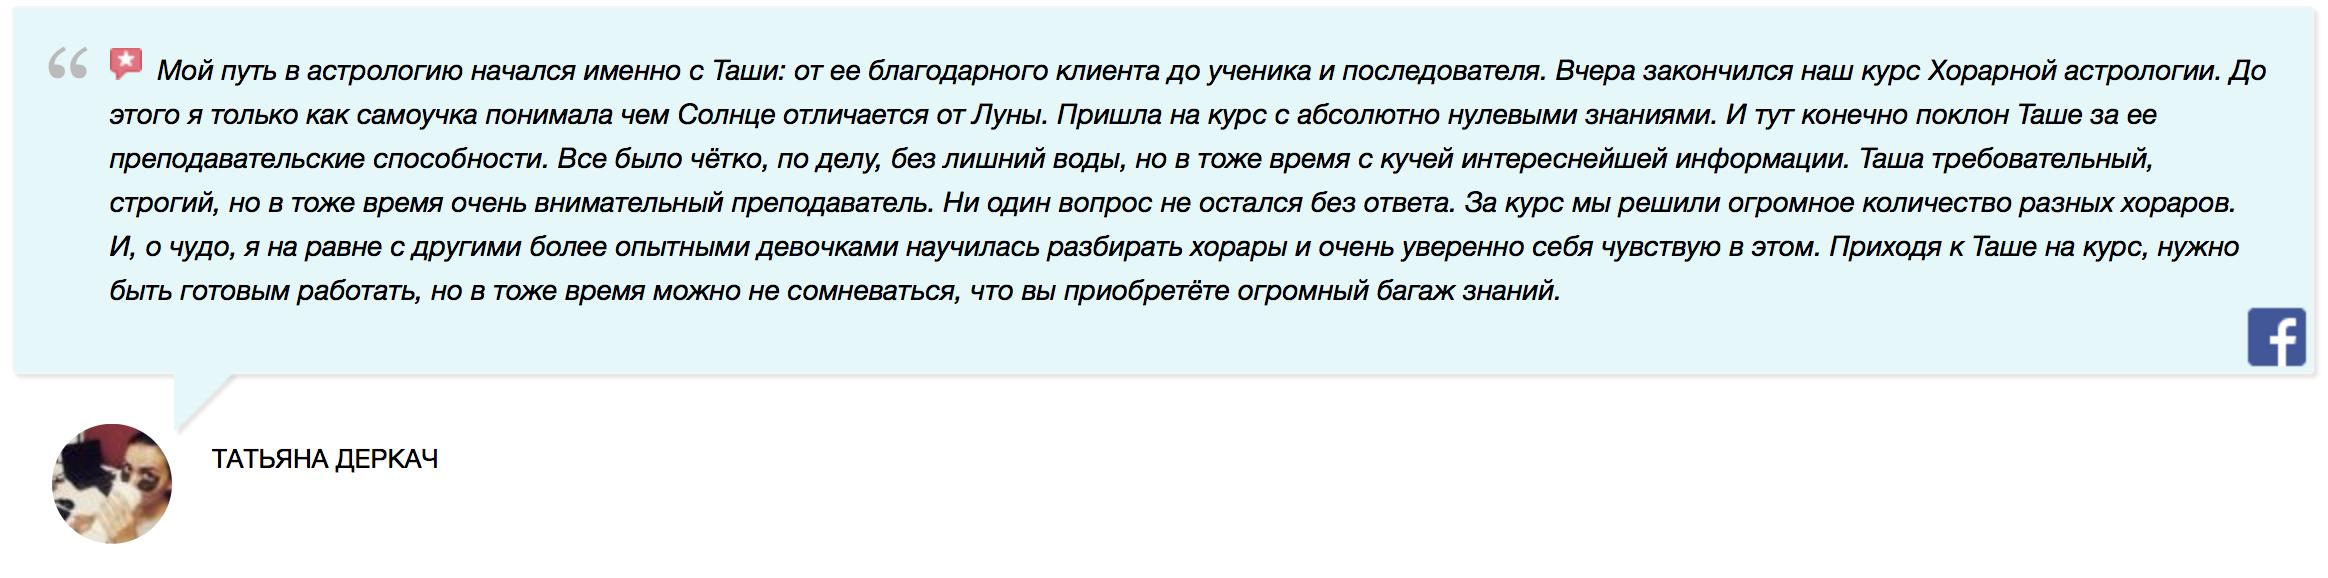 https://astrologtasha.ru/wp-content/uploads/2021/02/Screen-Shot-2021-02-09-at-12.00.36-PM.png